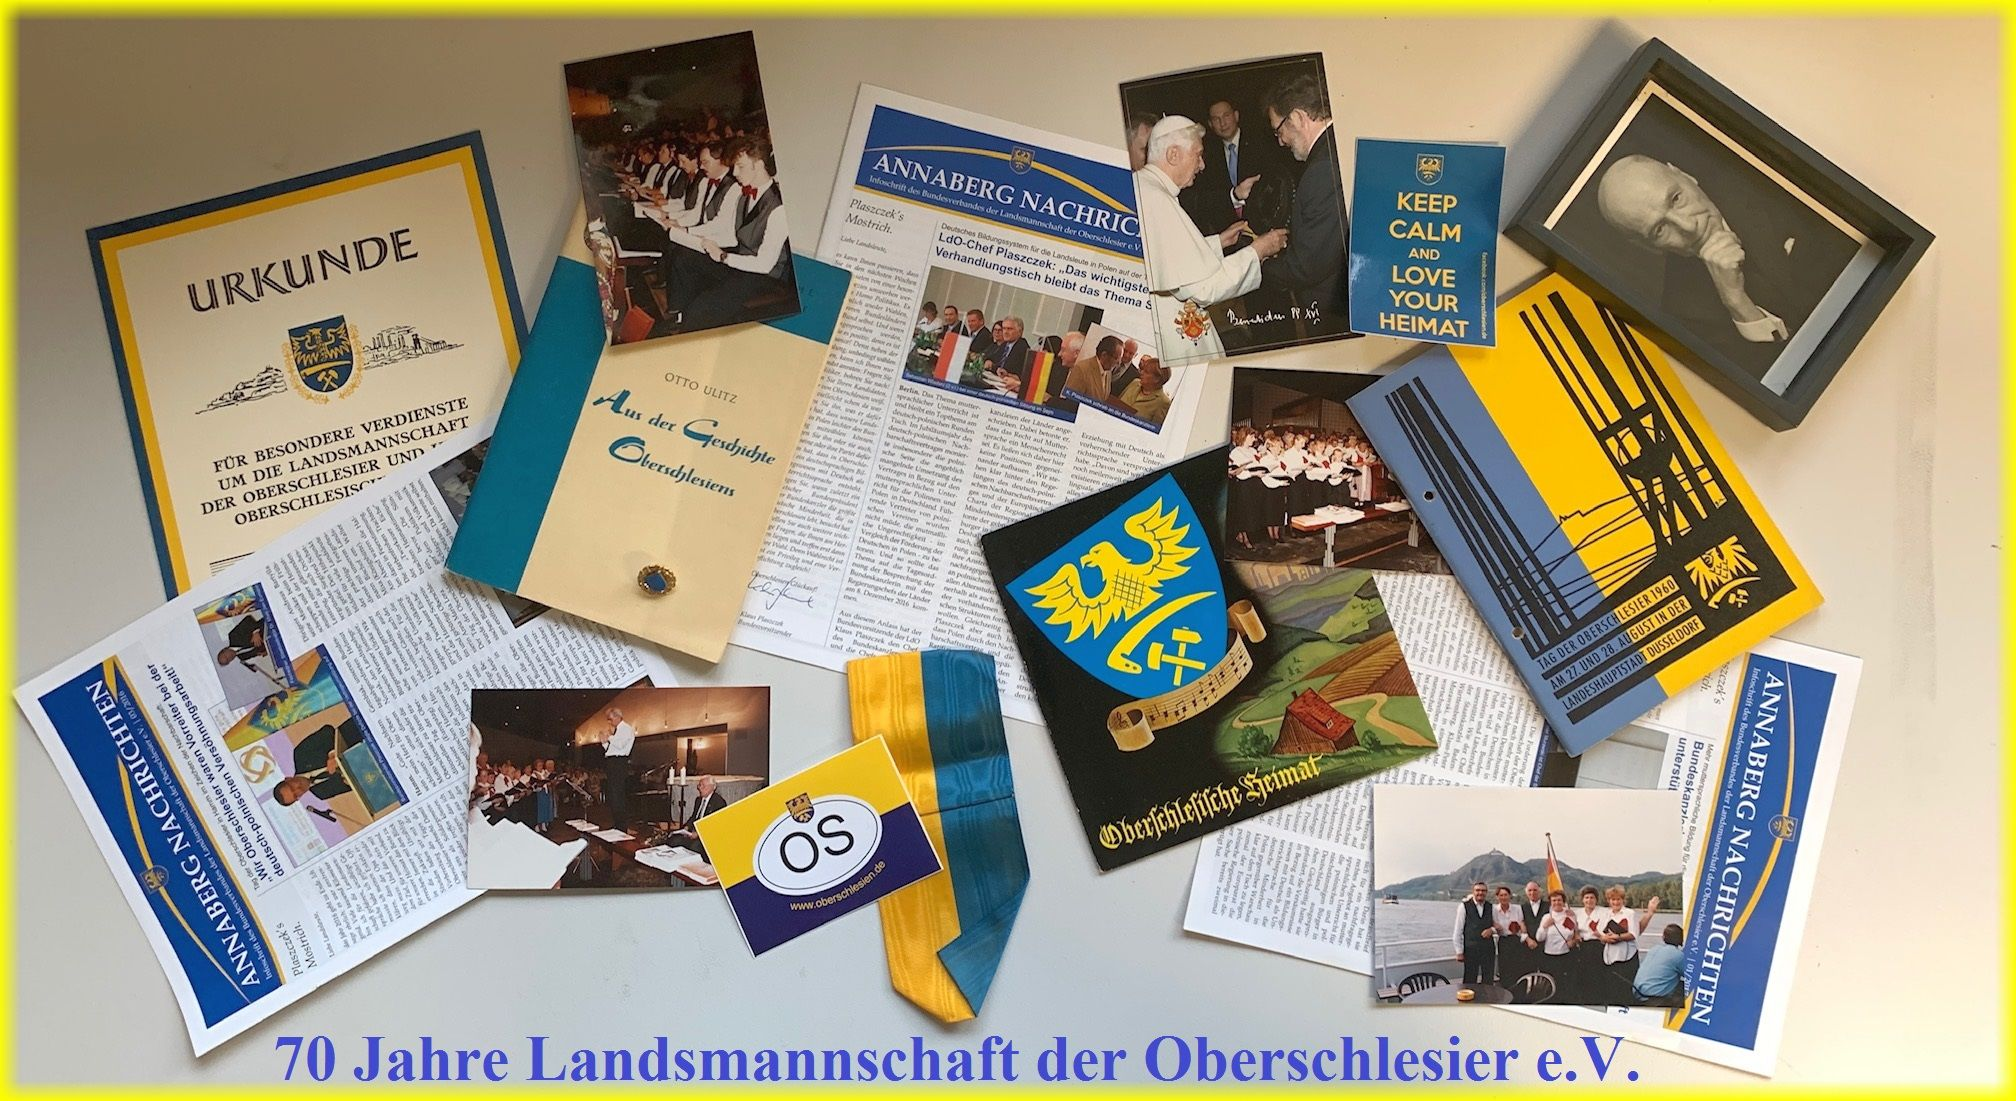 70. Jubiläum der Landsmannschaft der Oberschlesier e.V.